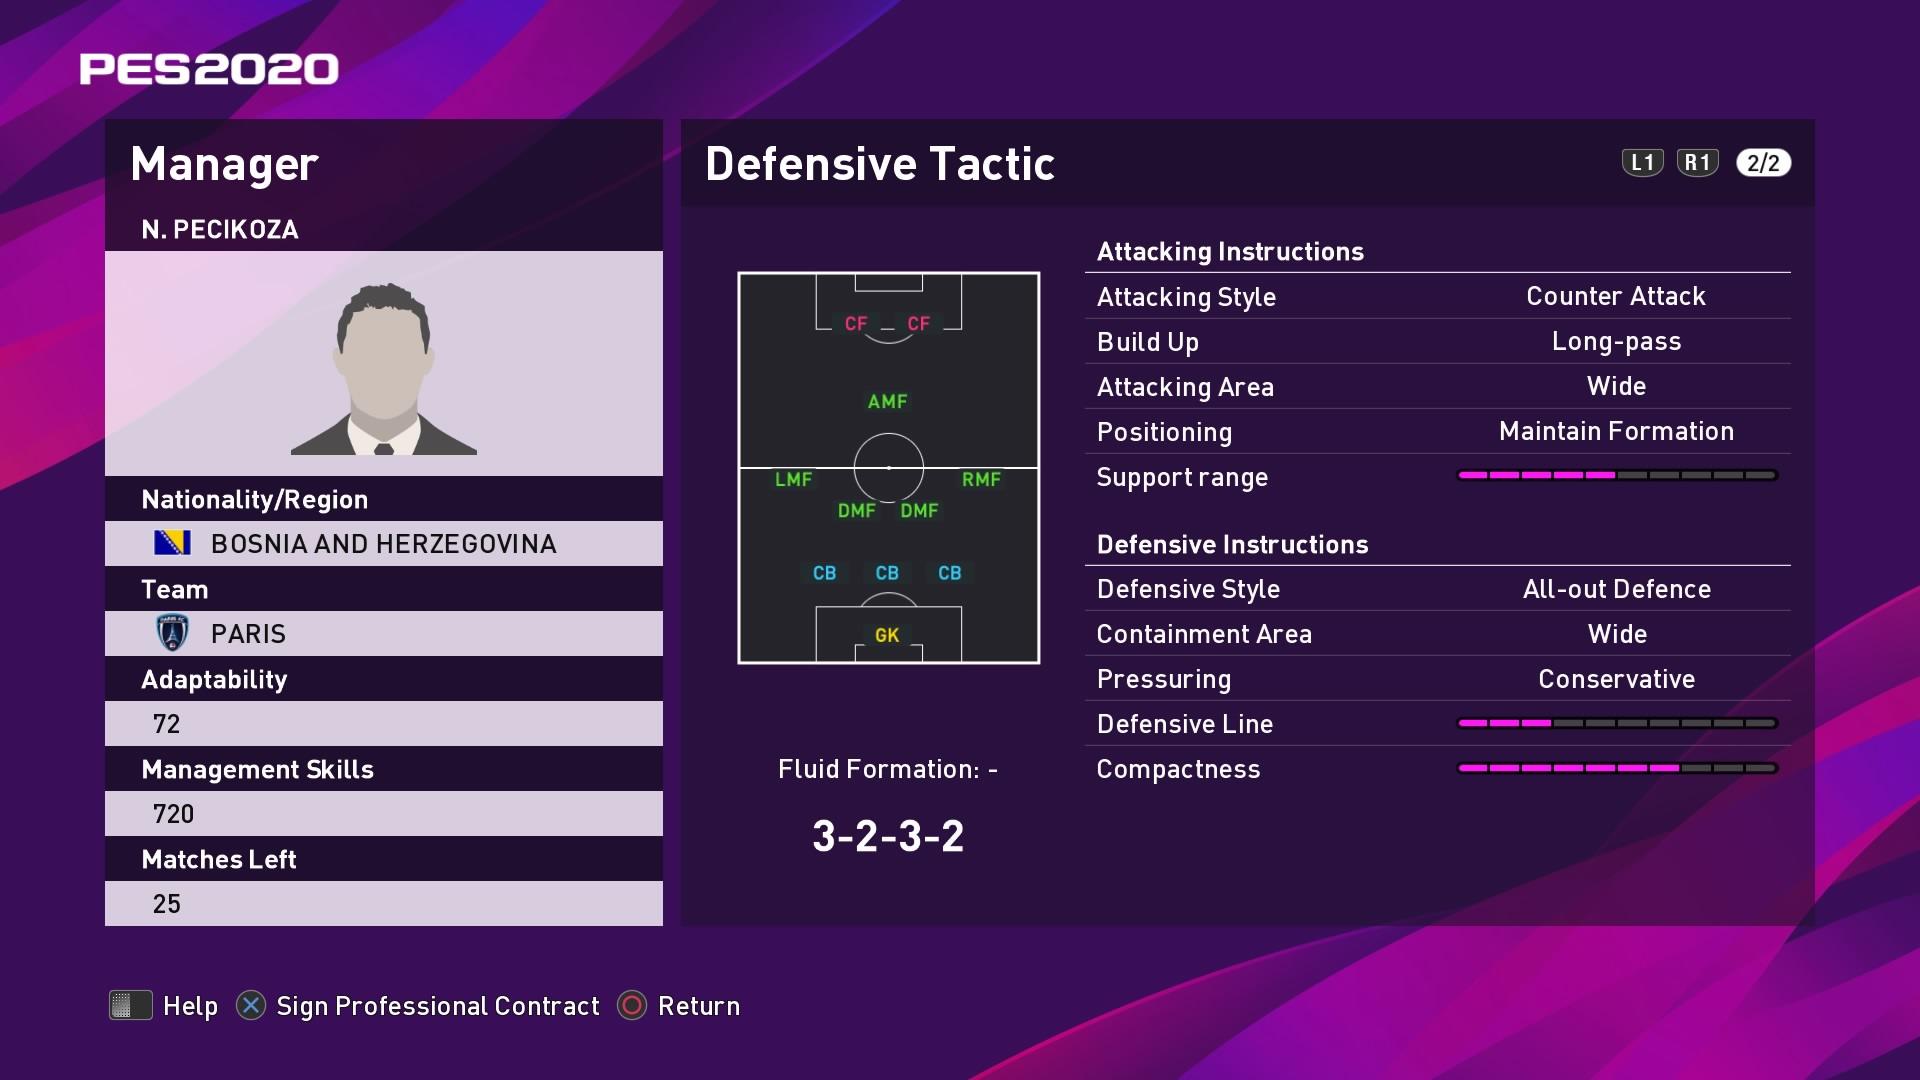 N. Pecikoza (Mehmed Baždarević) Defensive Tactic in PES 2020 myClub